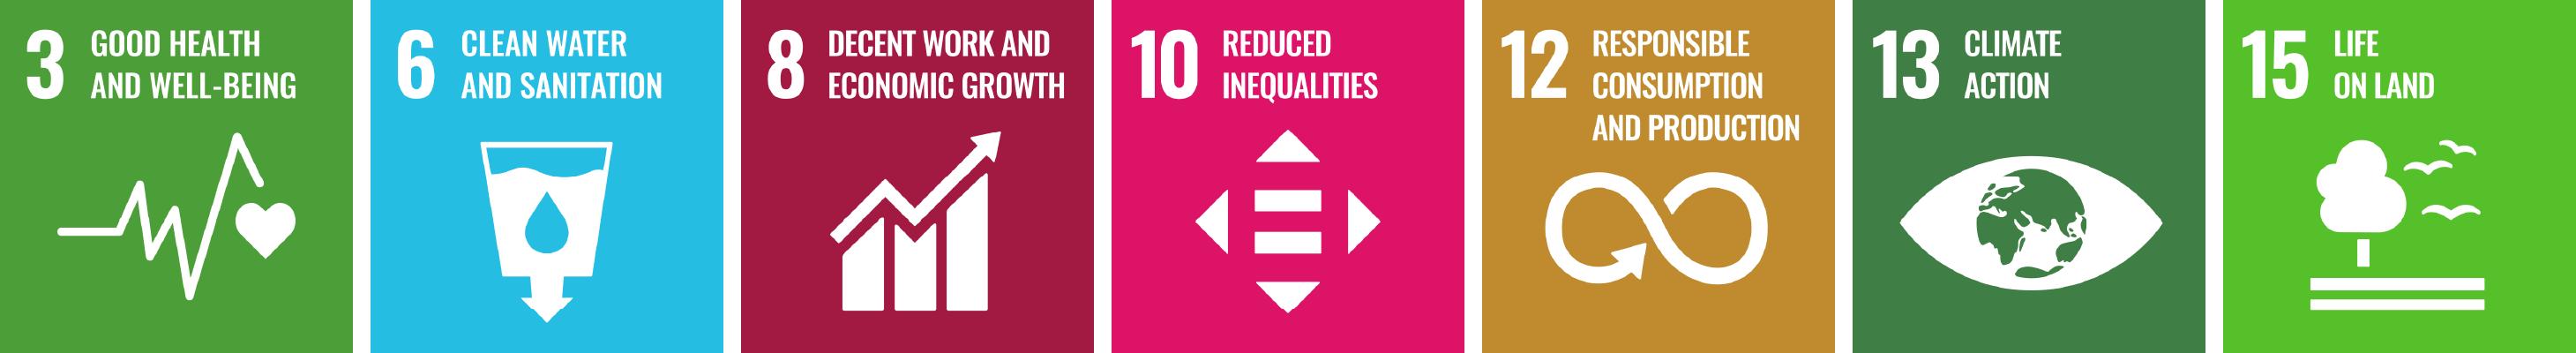 United Nations' Sustainable Development Goals (SDGs)